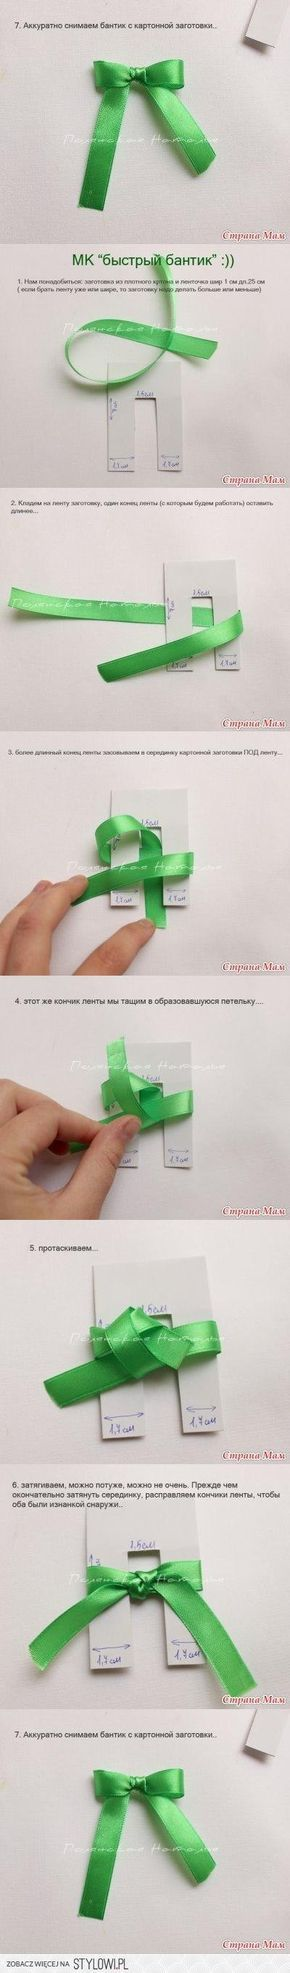 DIY Easy Ribbon Bow DIY Projects | UsefulDIY.com na Stylowi.pl